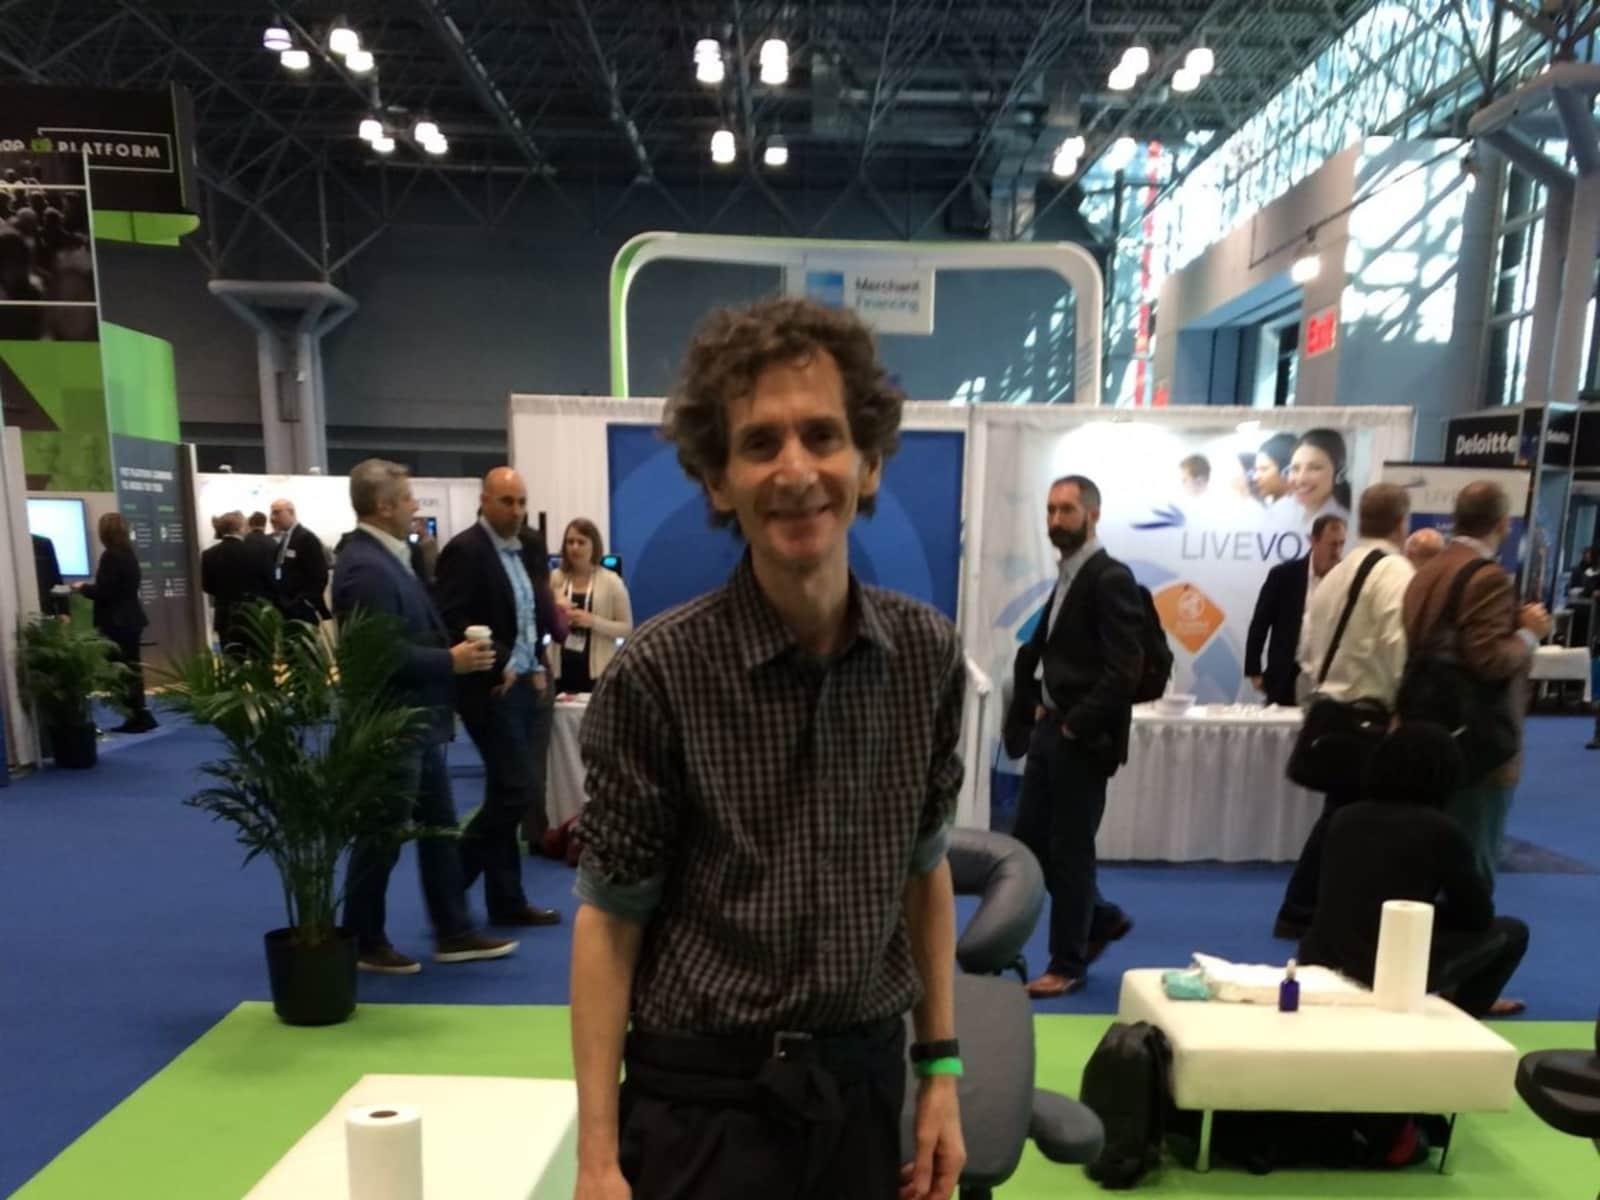 Tony from New York City, New York, United States